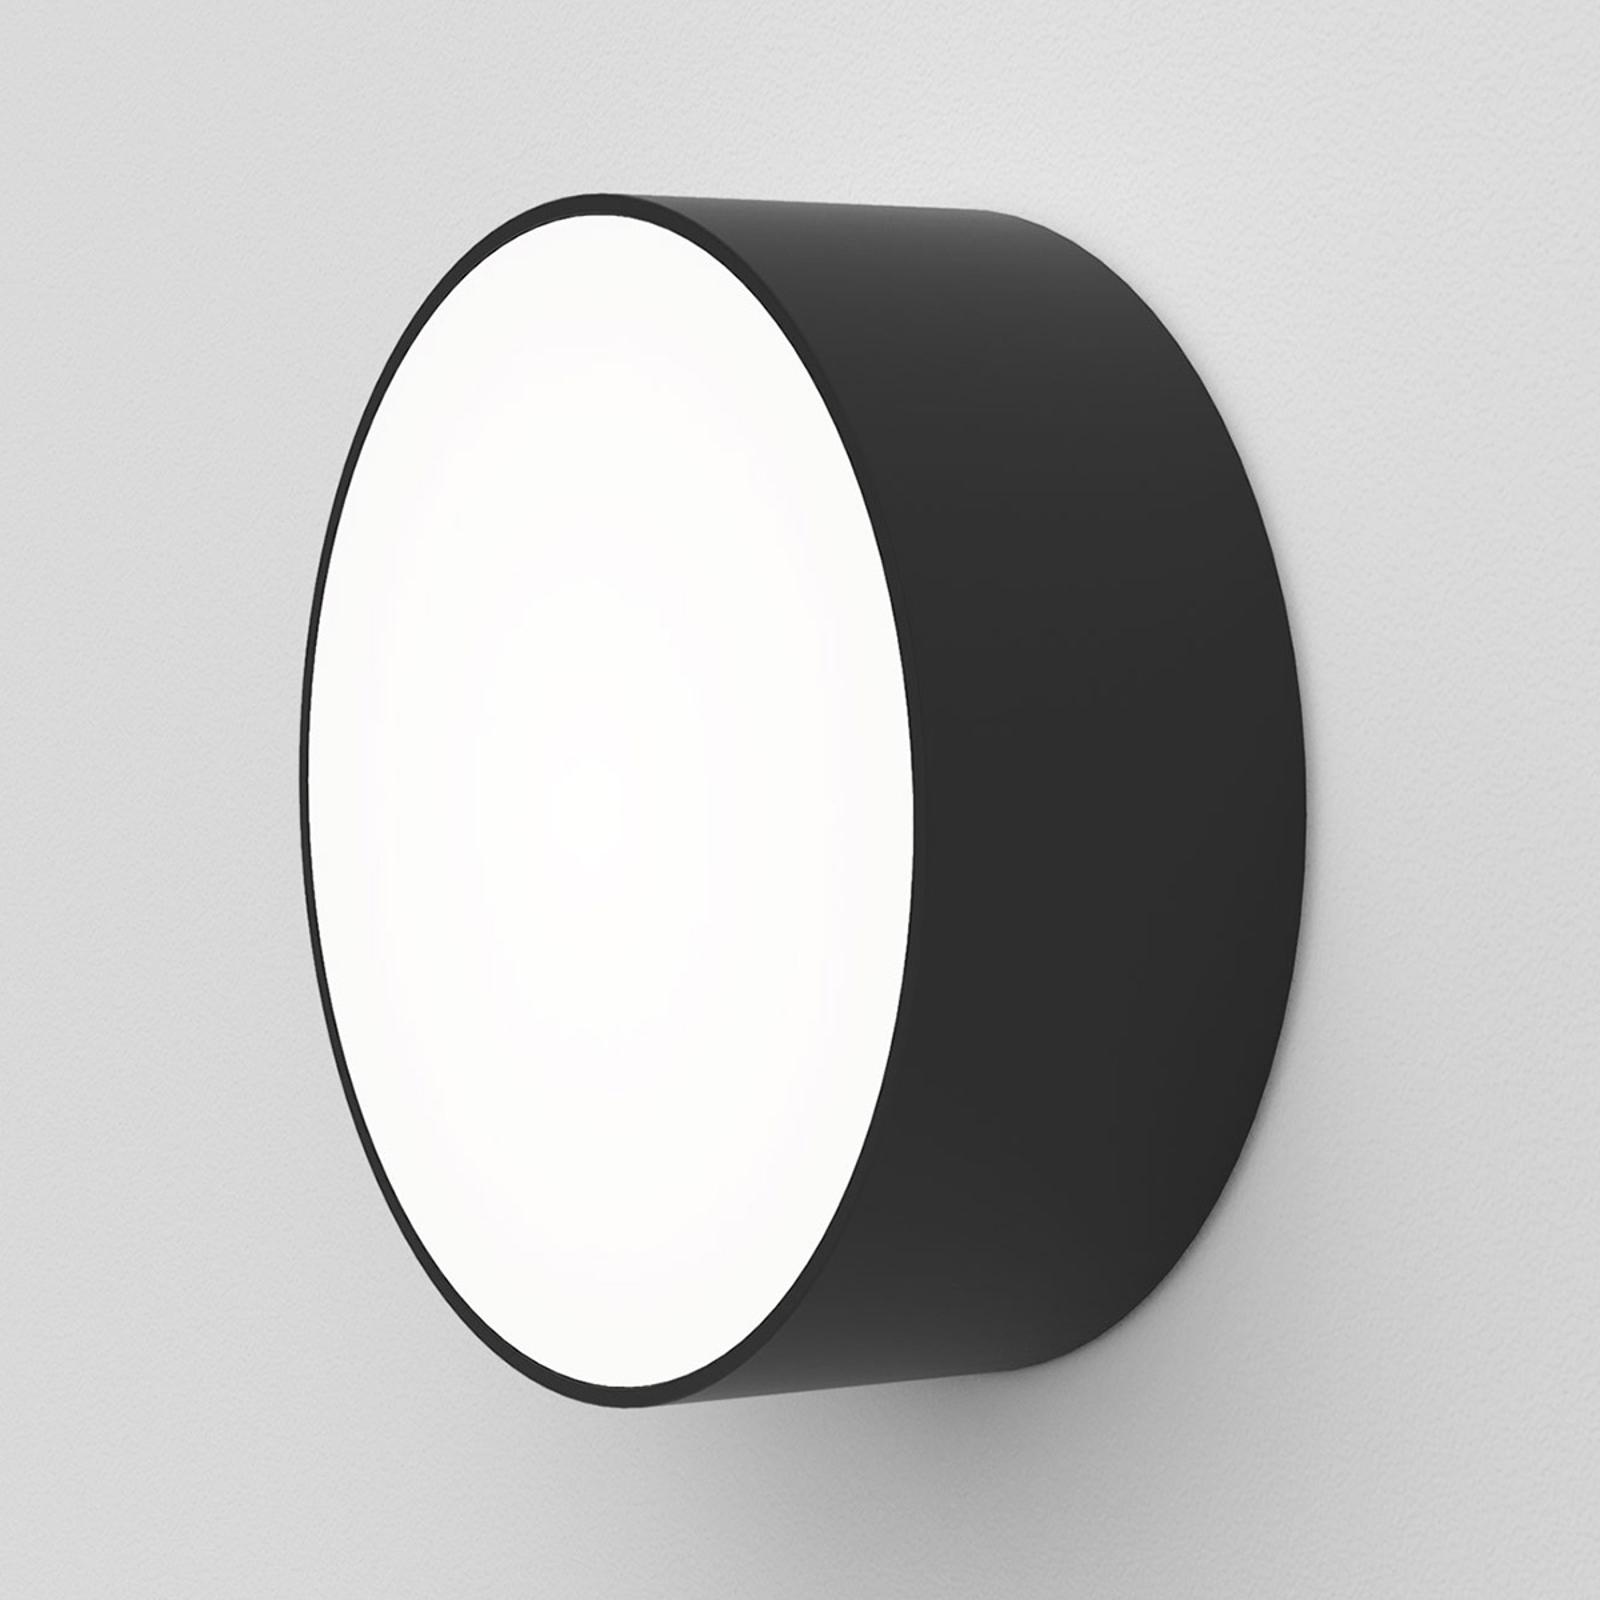 Astro Kea Round 150 LED-vegglampe, svart